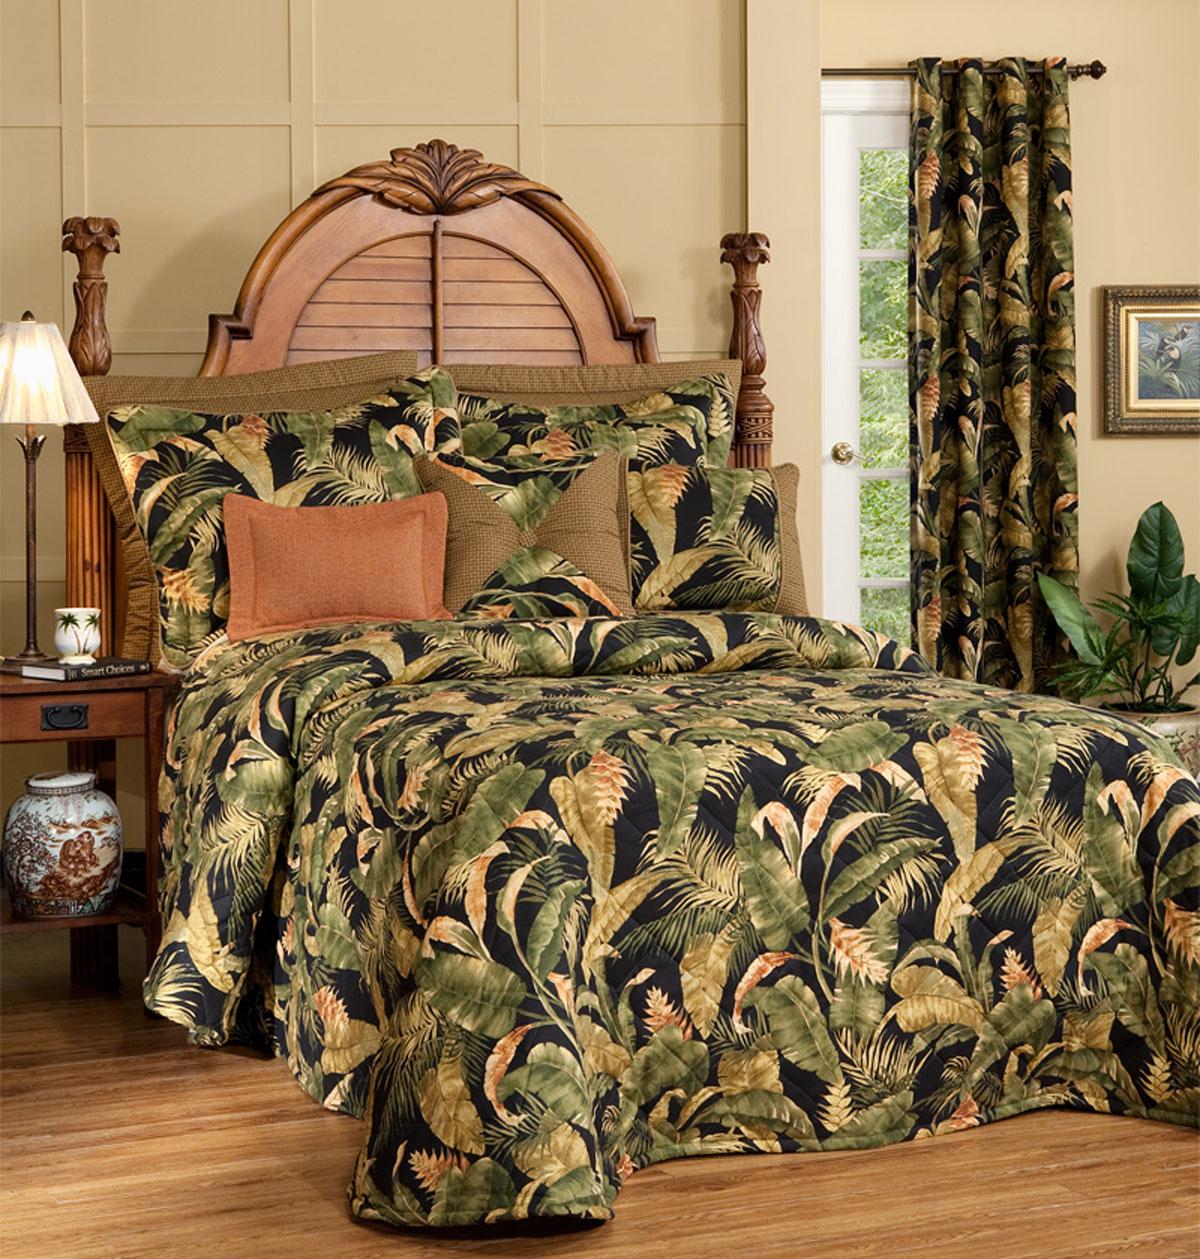 La Selva Black Bedspread By Thomasville Home